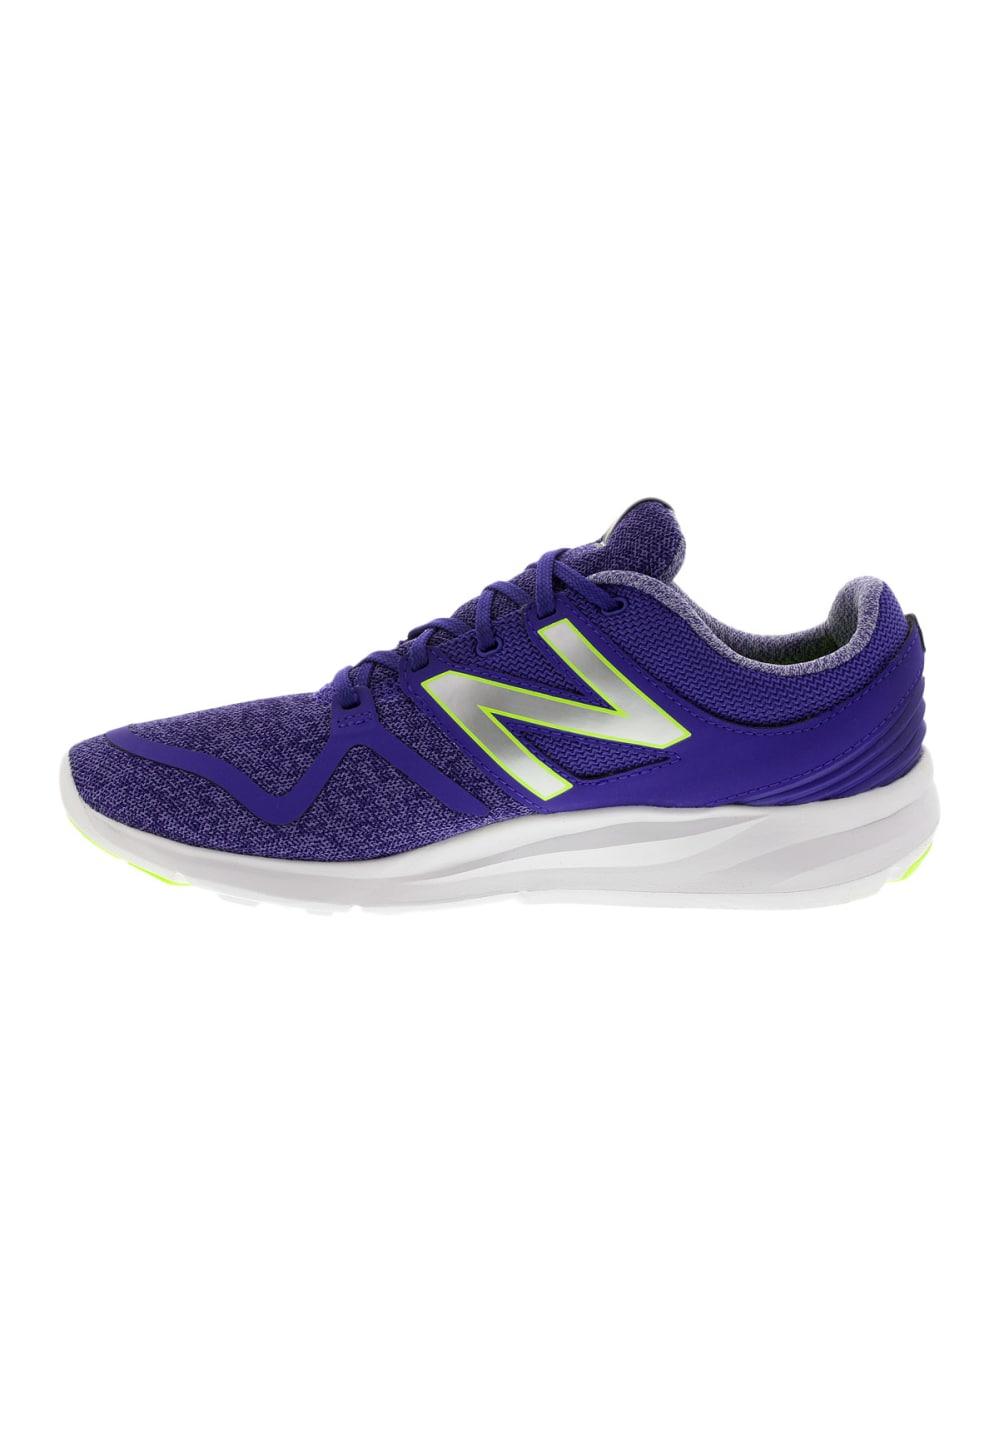 Chaussures 21run Violet Pour New Vazee Femme Balance Coast Running wZBtqT